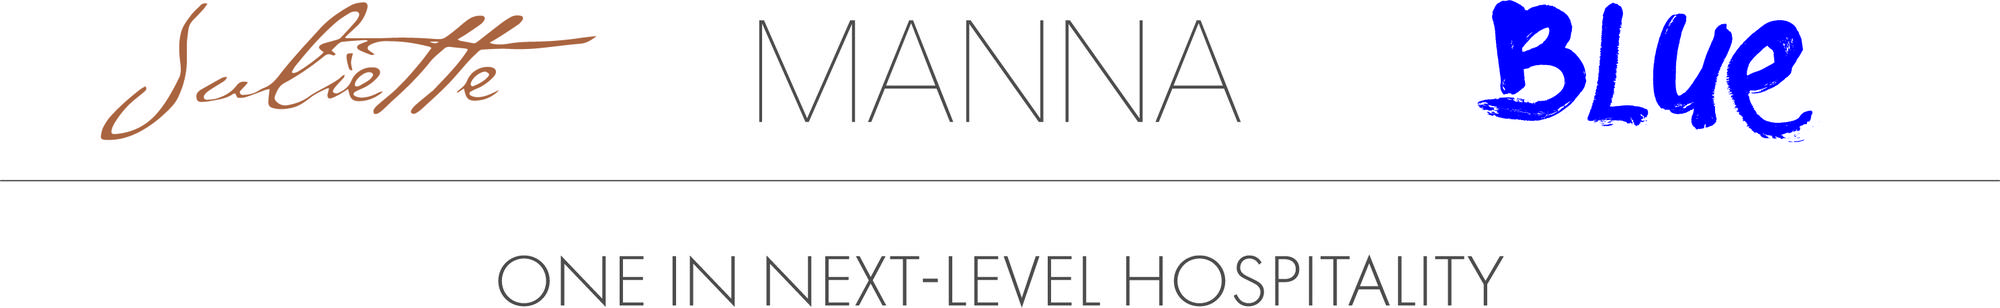 MANNA-JULIETTE-BLUE-ONE_afbeelding_website.jpg